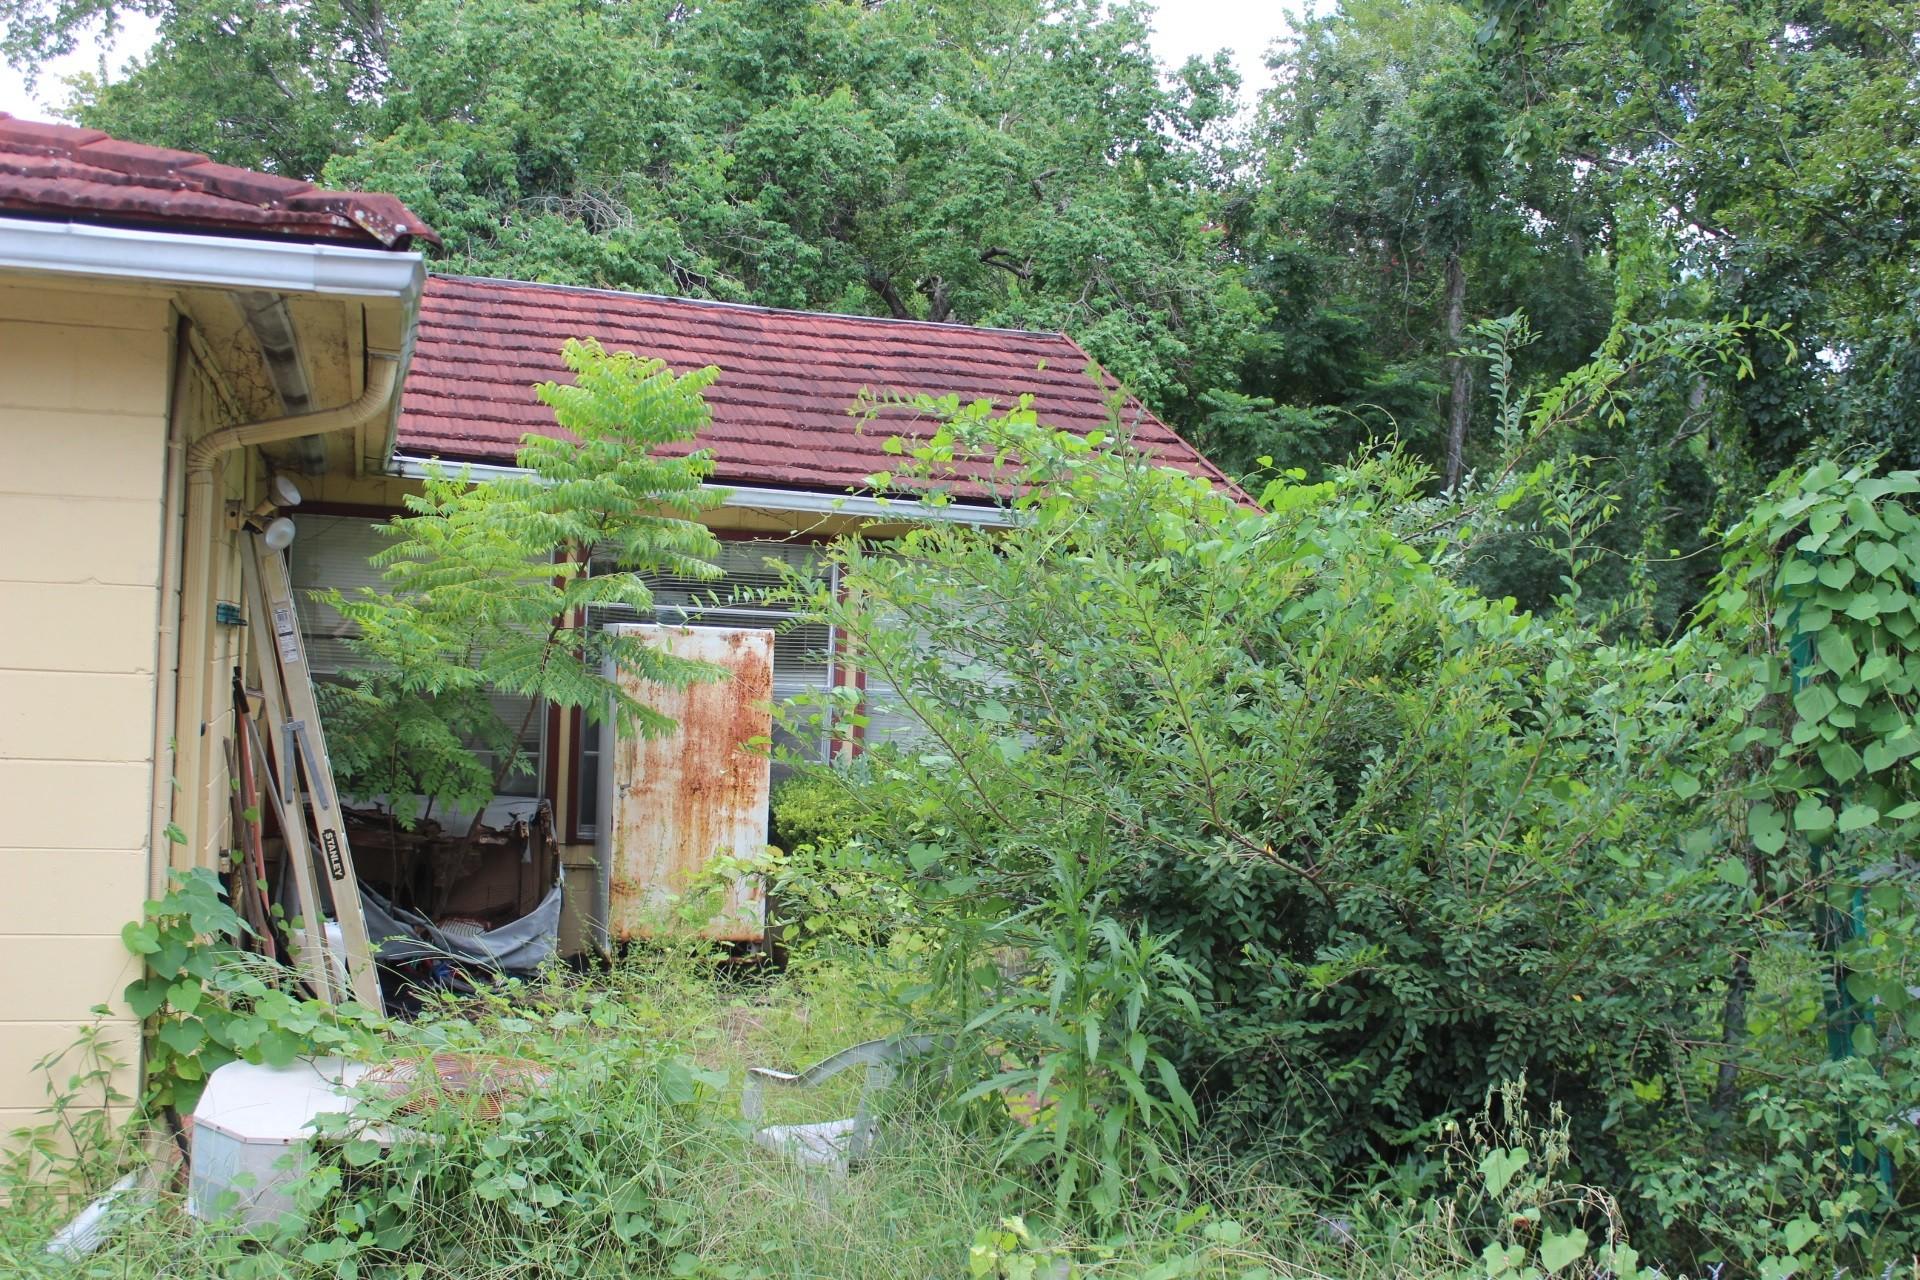 repeat code offender u0027s backyard a health hazard clay today